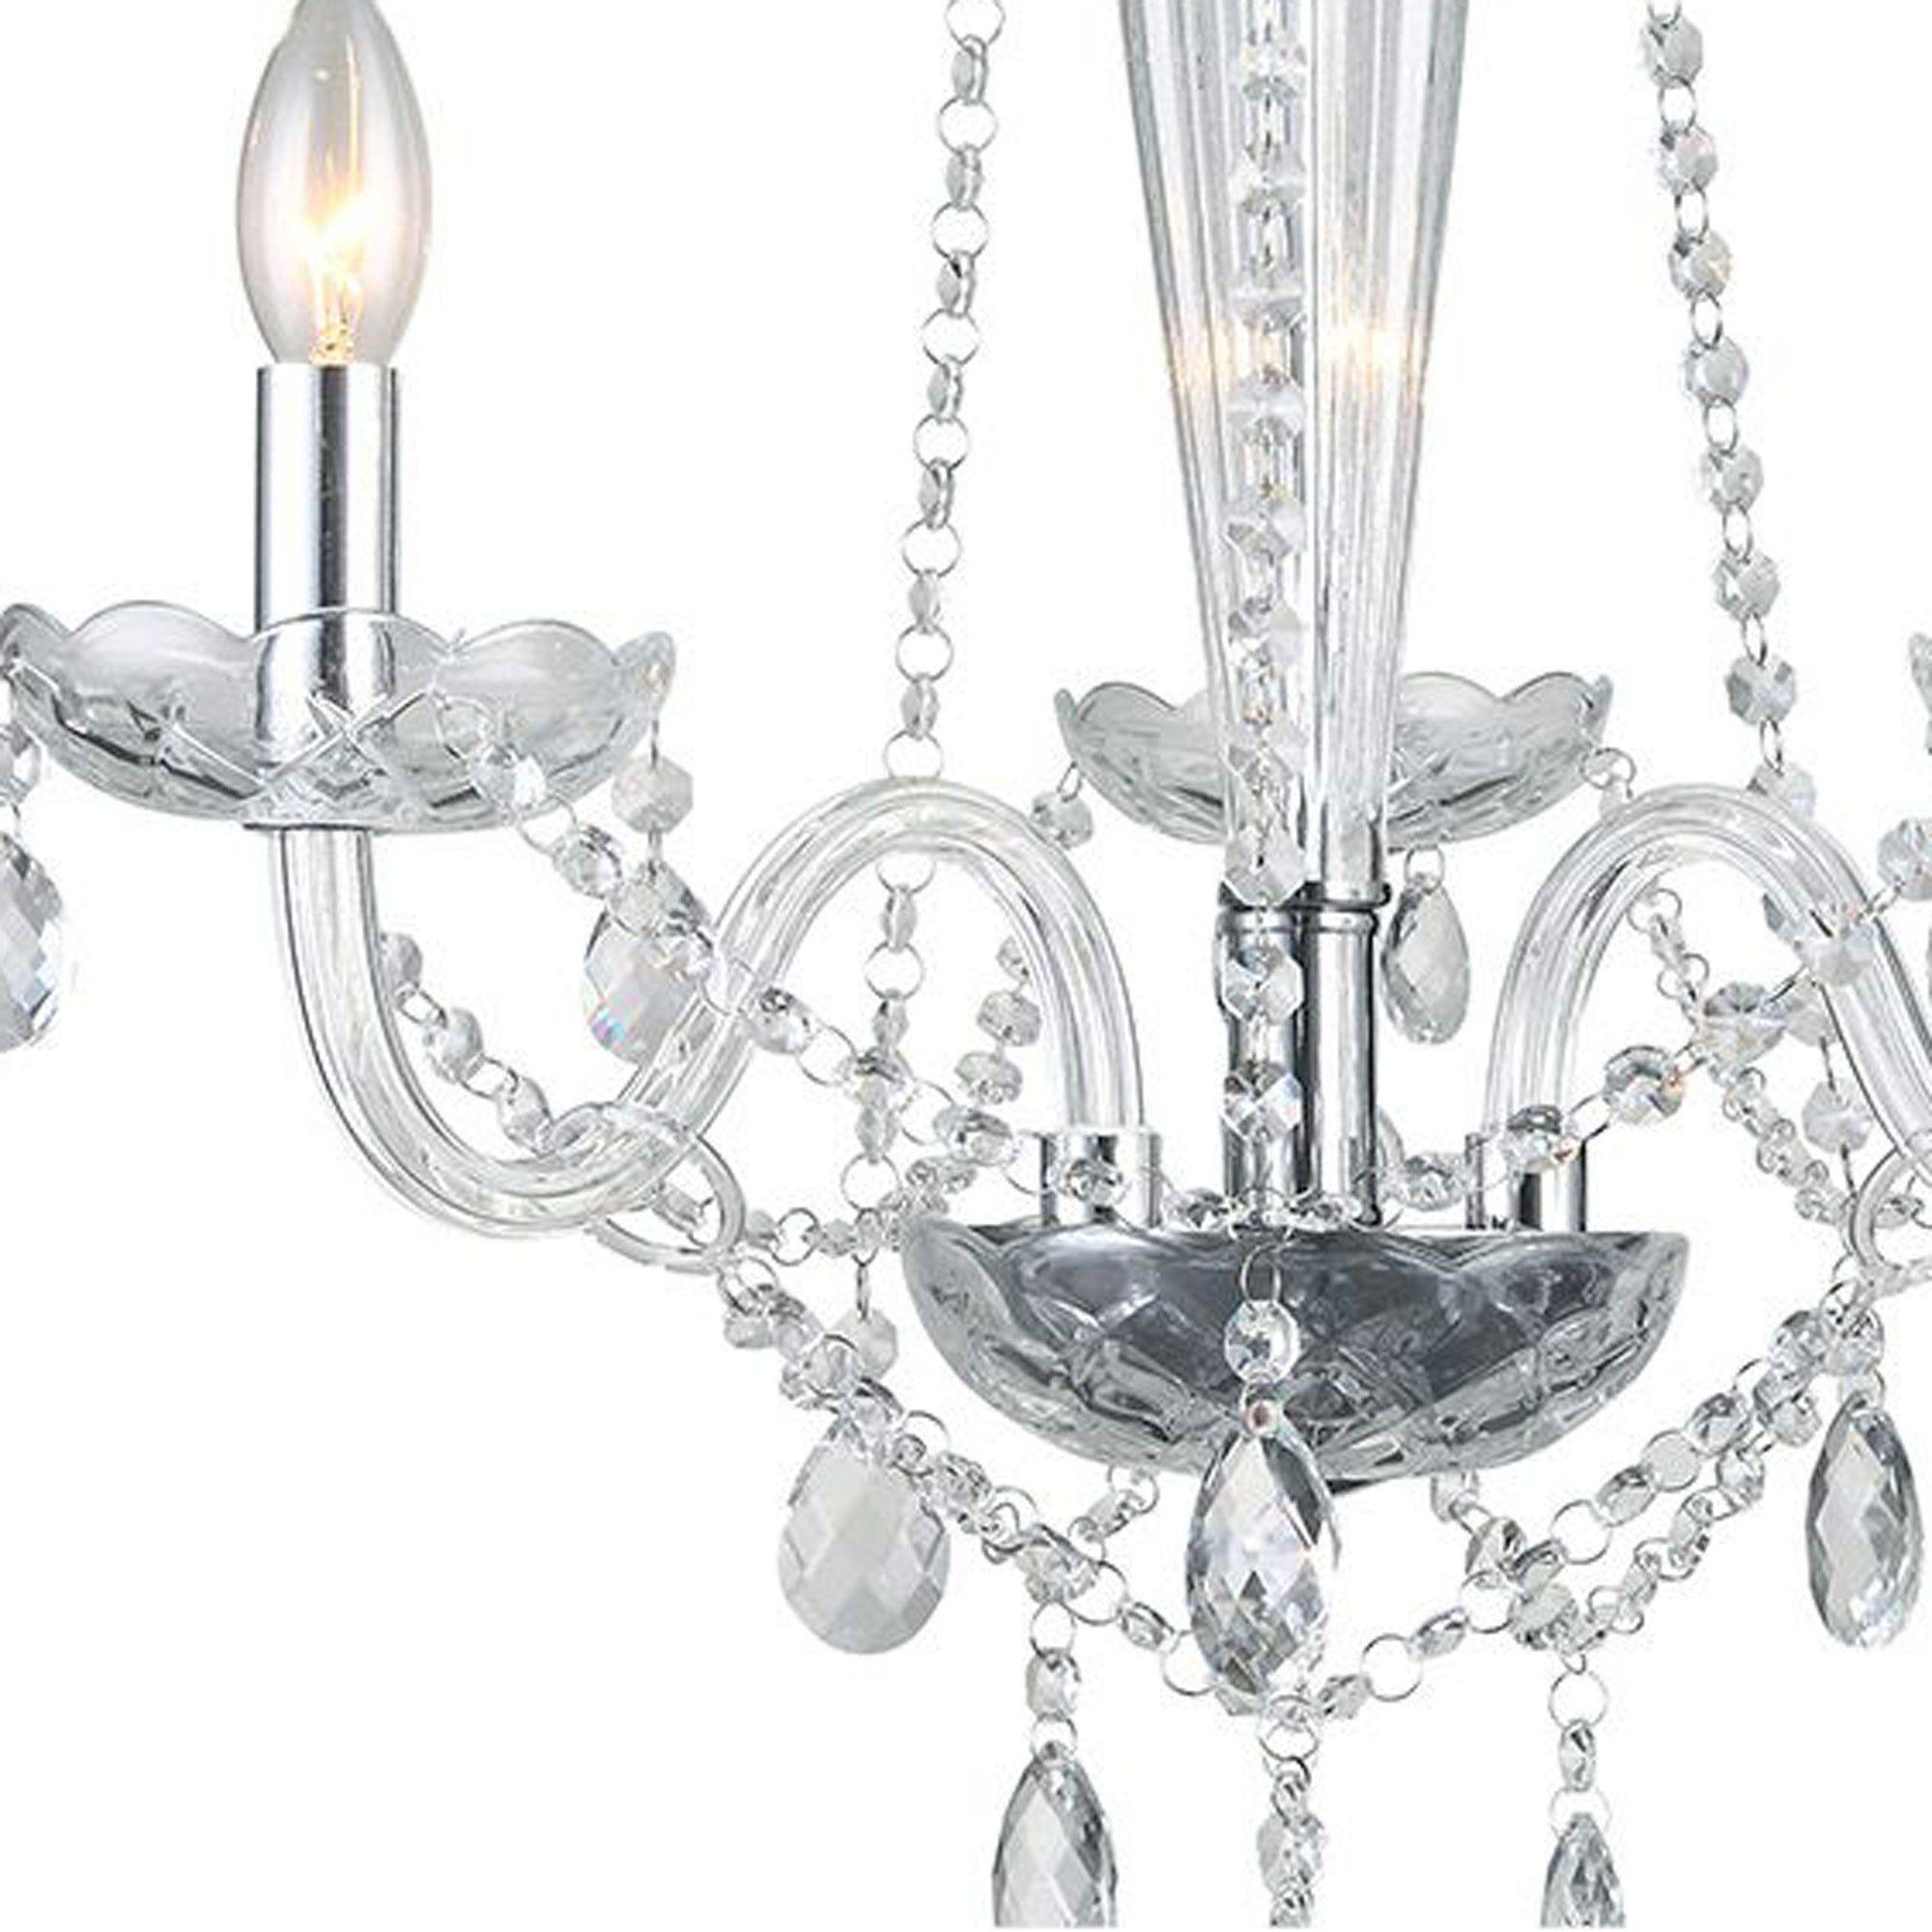 Lustre Candelabro de Cristal Maria Tereza - 3 Braços Transparente